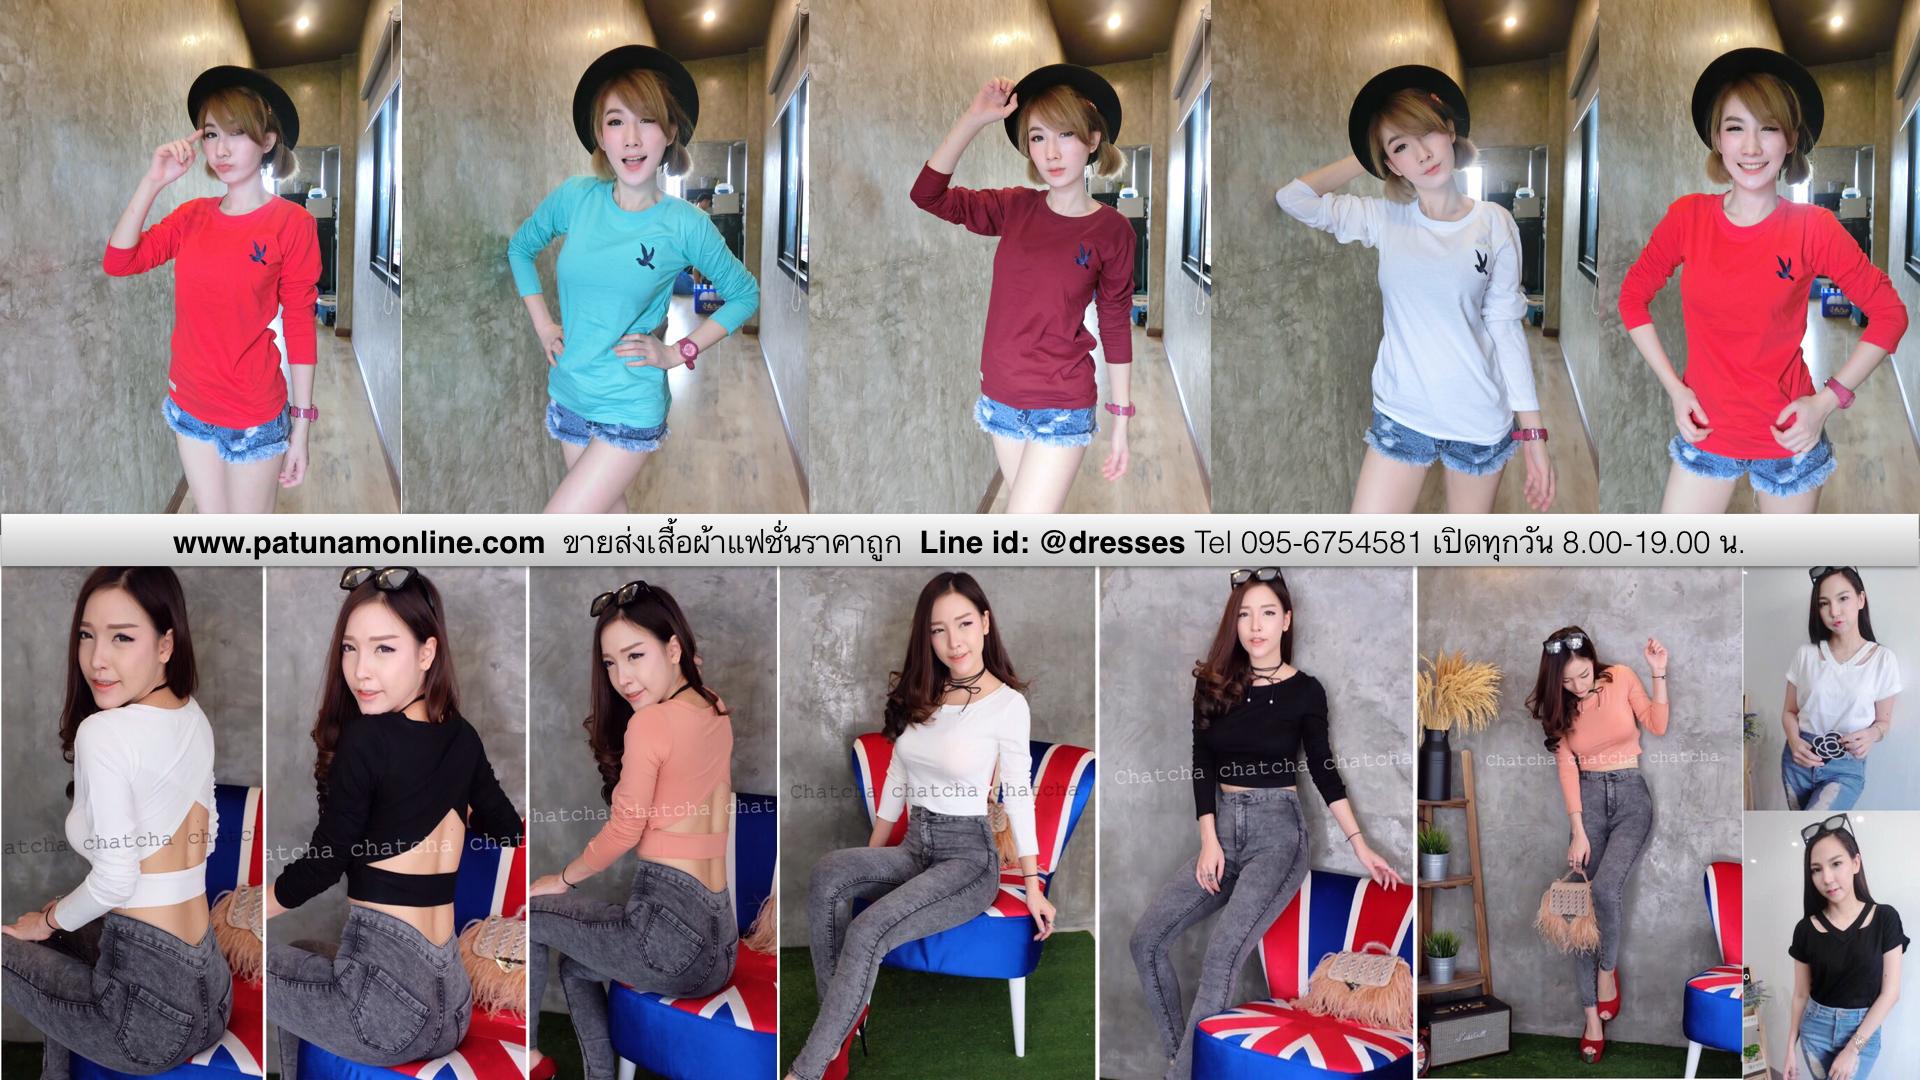 เสื้อยืดแฟชั่นผู้หญิง เสื้อยืดแฟชั่นเกาหลี.015